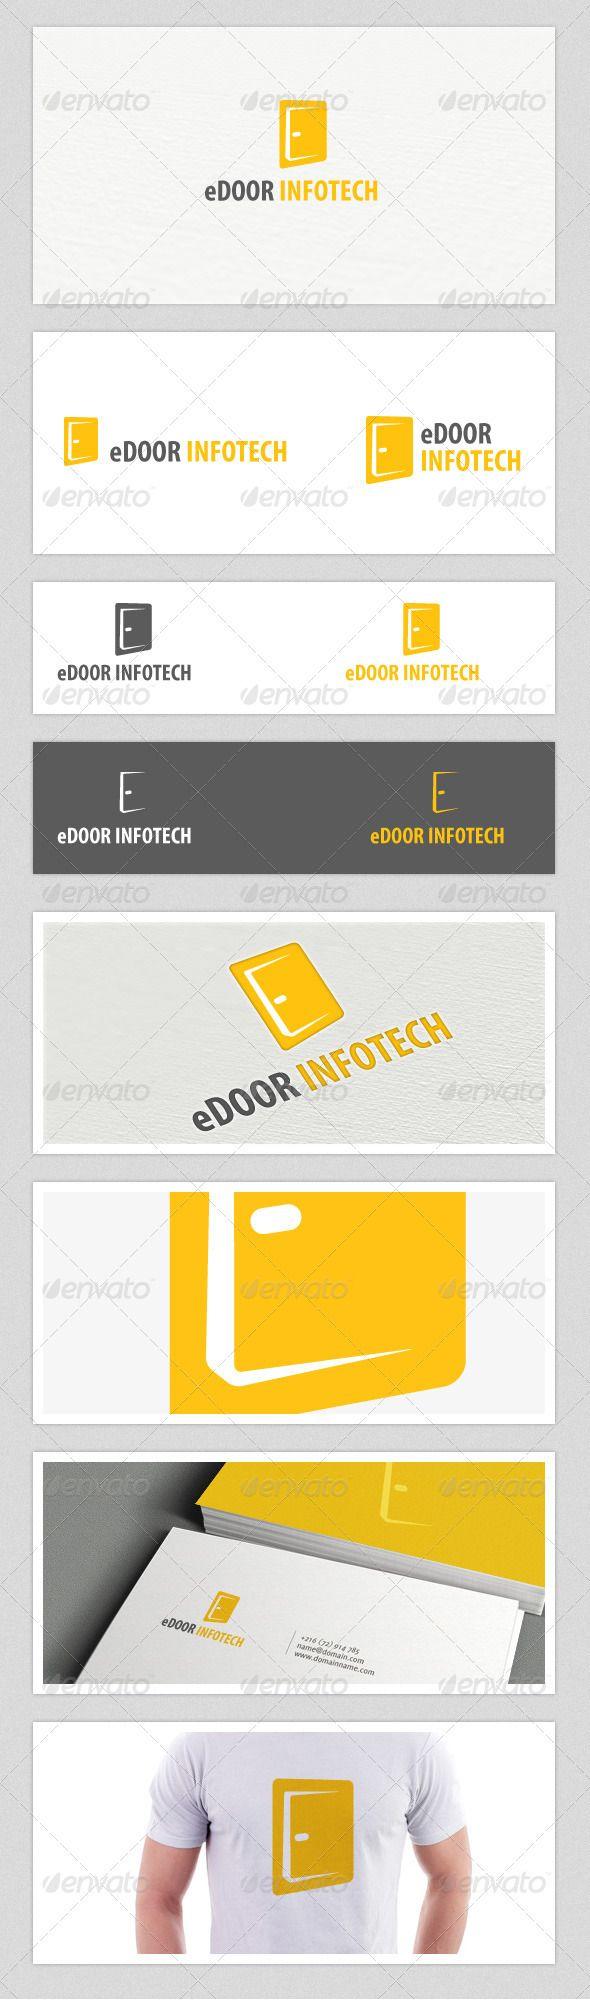 eDoor Infotech Logo — Photoshop PSD #isp #network • Available here → https://graphicriver.net/item/edoor-infotech-logo/3932482?ref=pxcr